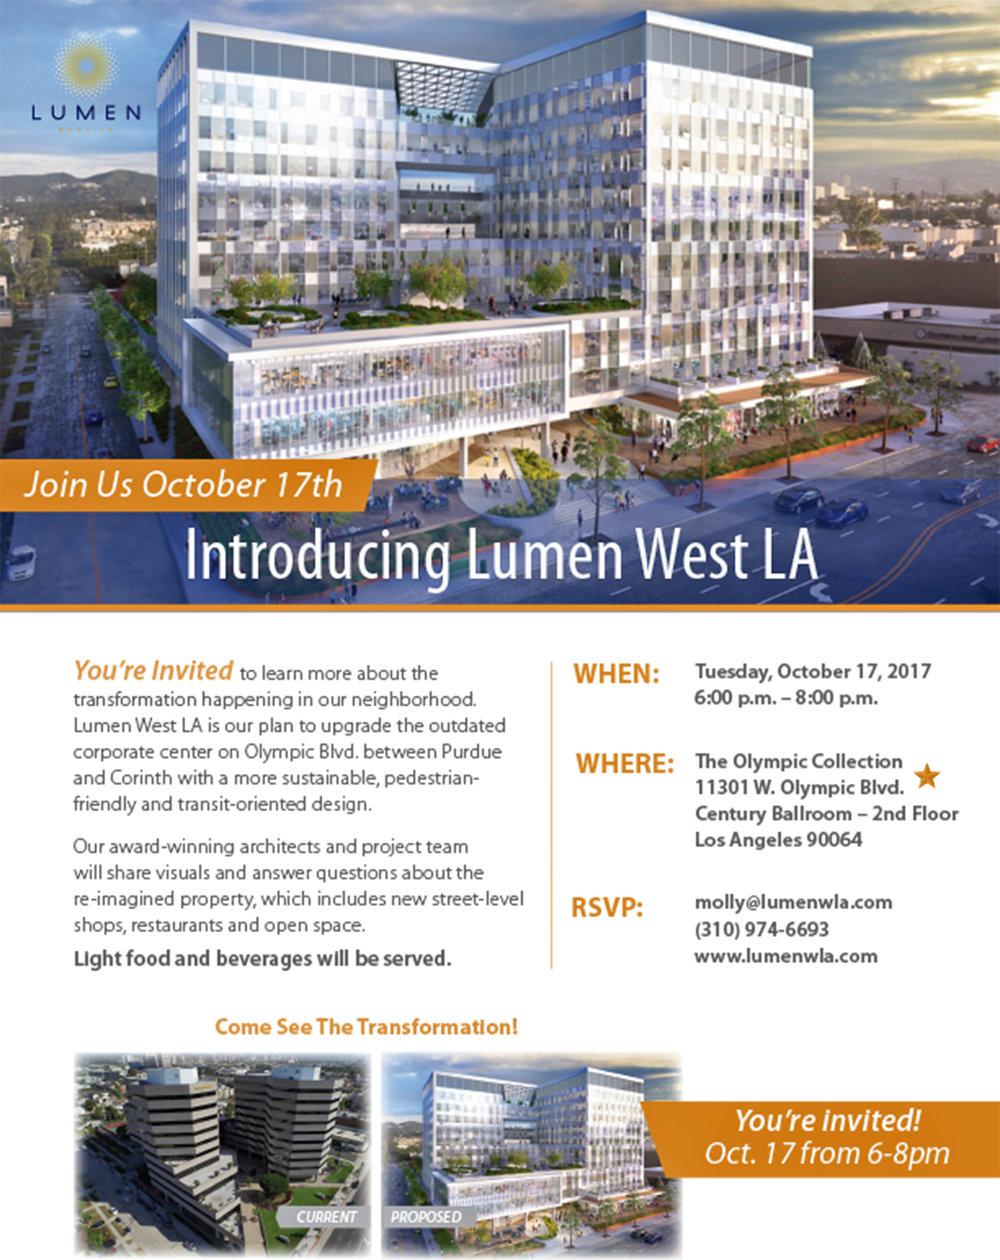 Lumen+West+LA+Invitation+(1).jpg